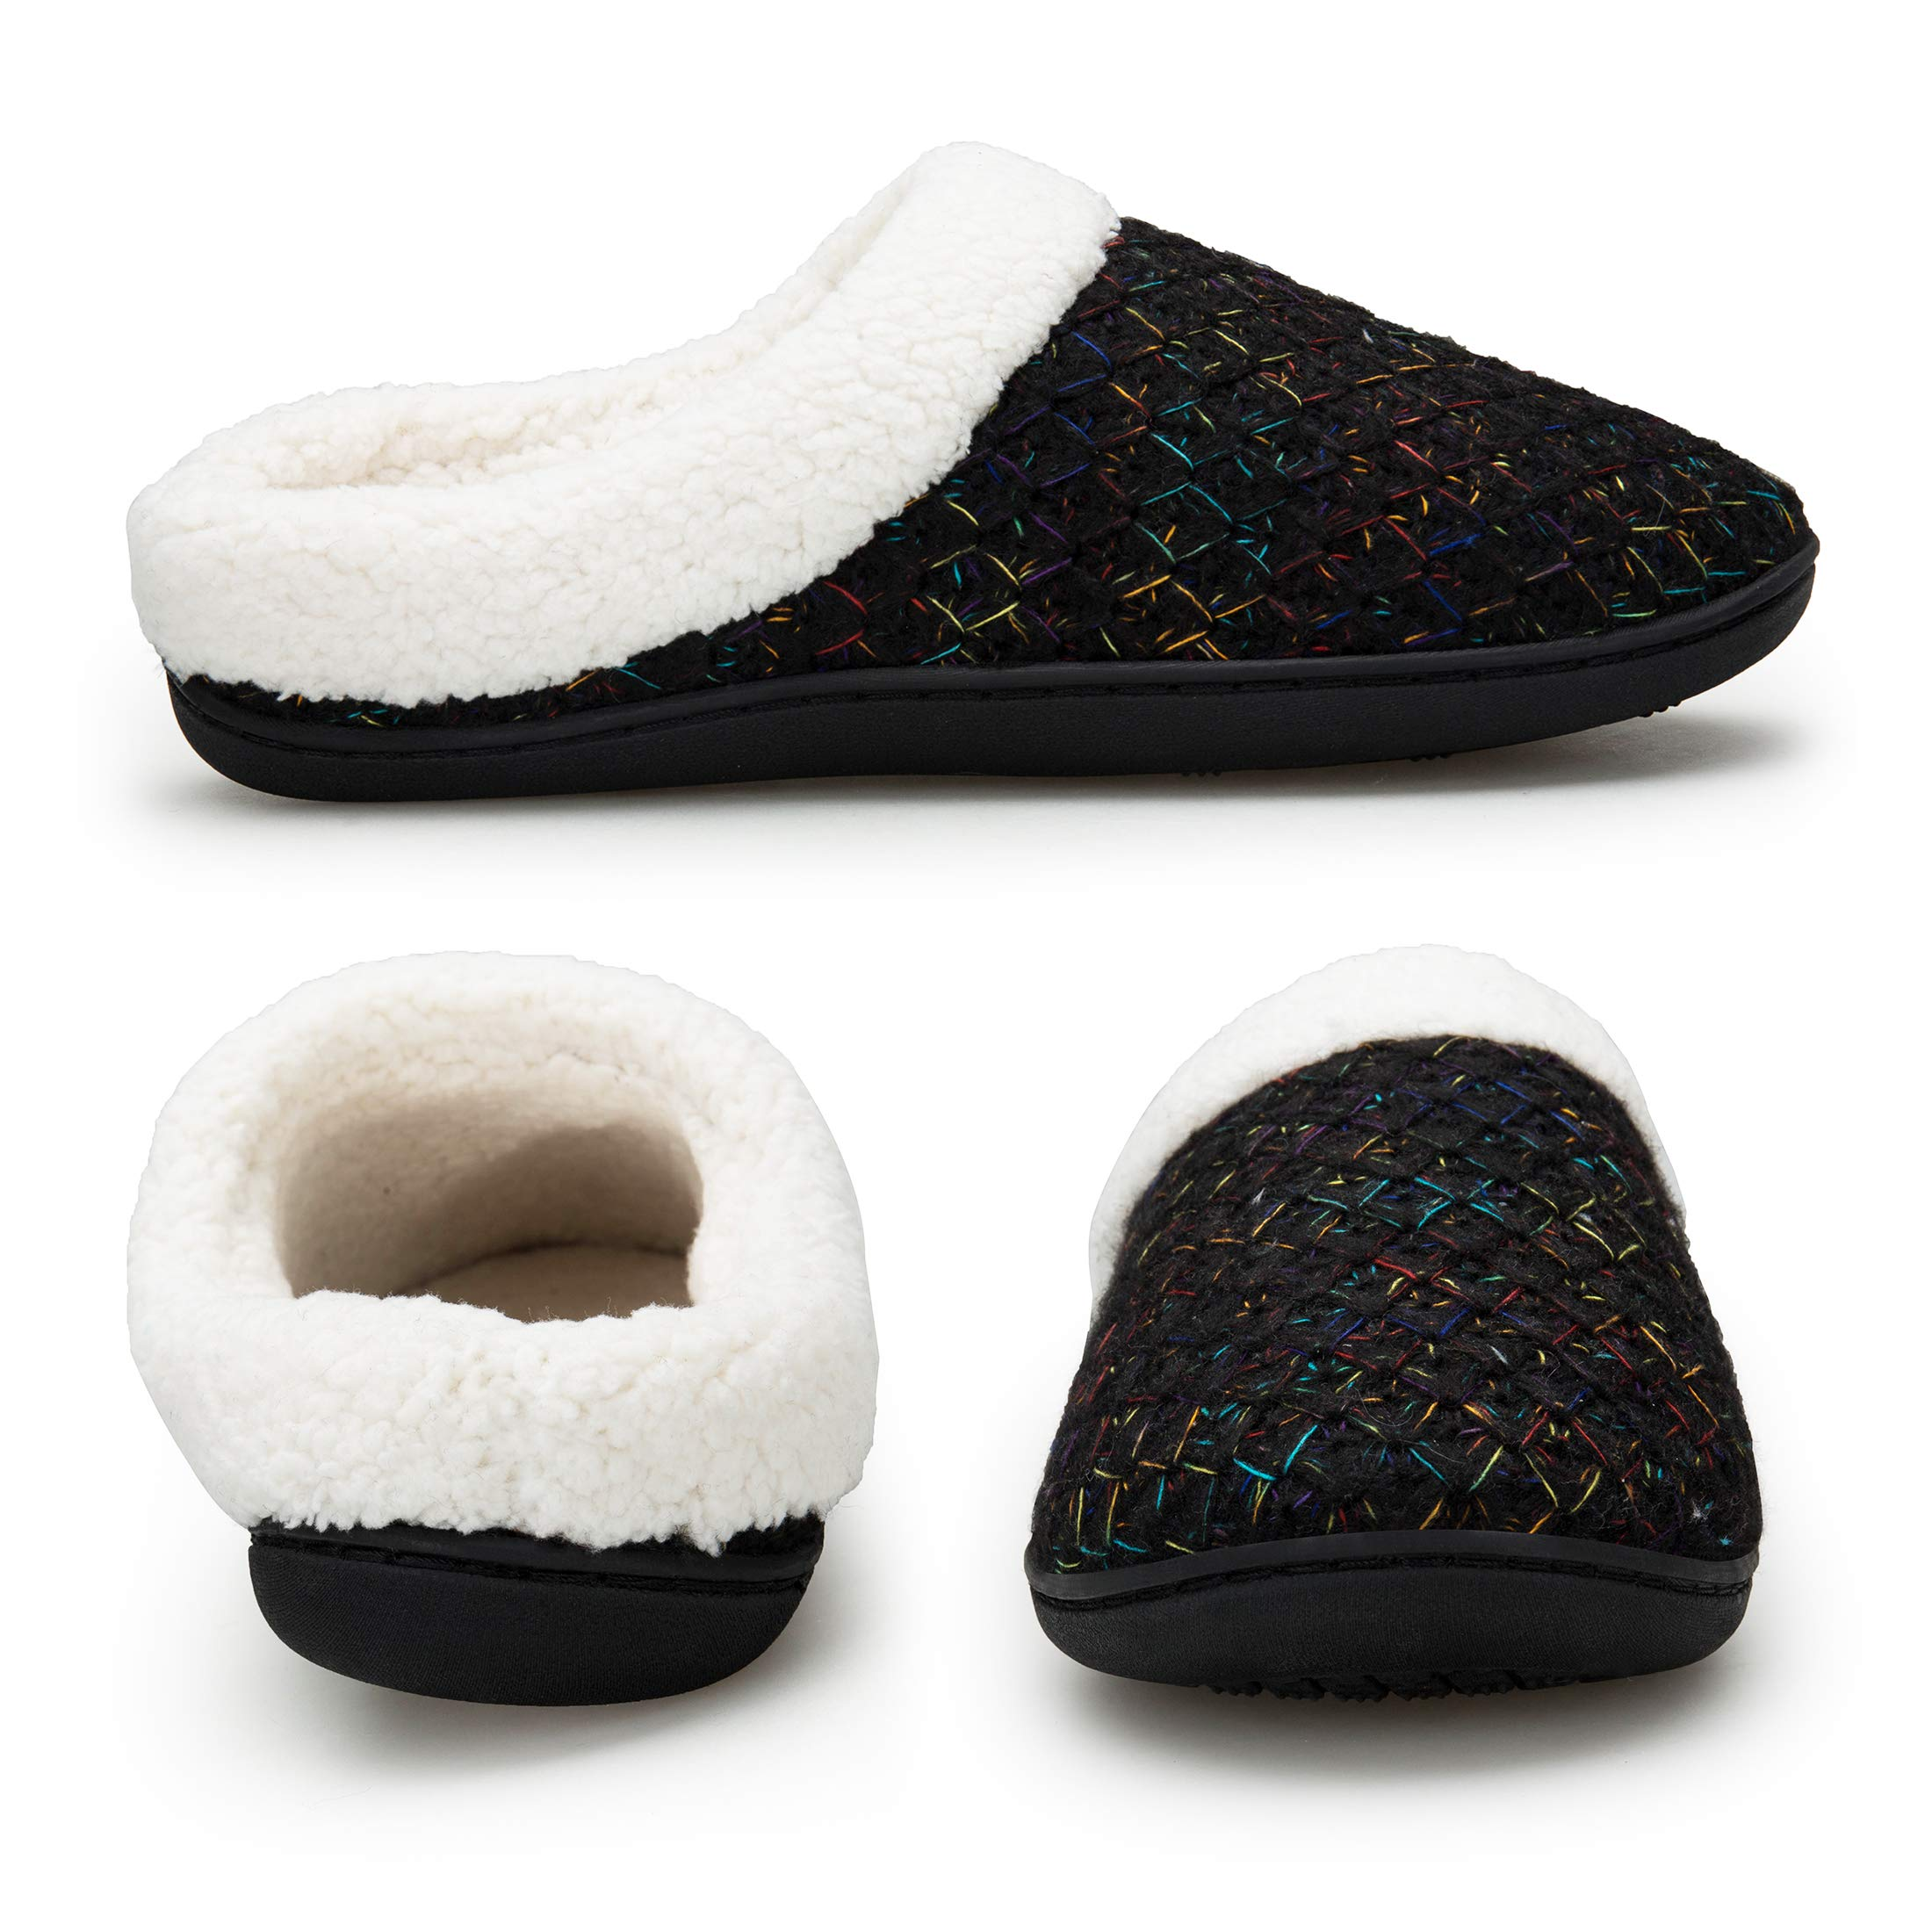 EAST LANDER Women's Memory Foam House Slippers Washable Anti-Slip Slippers Indoor ShoesELMT002-W1-L